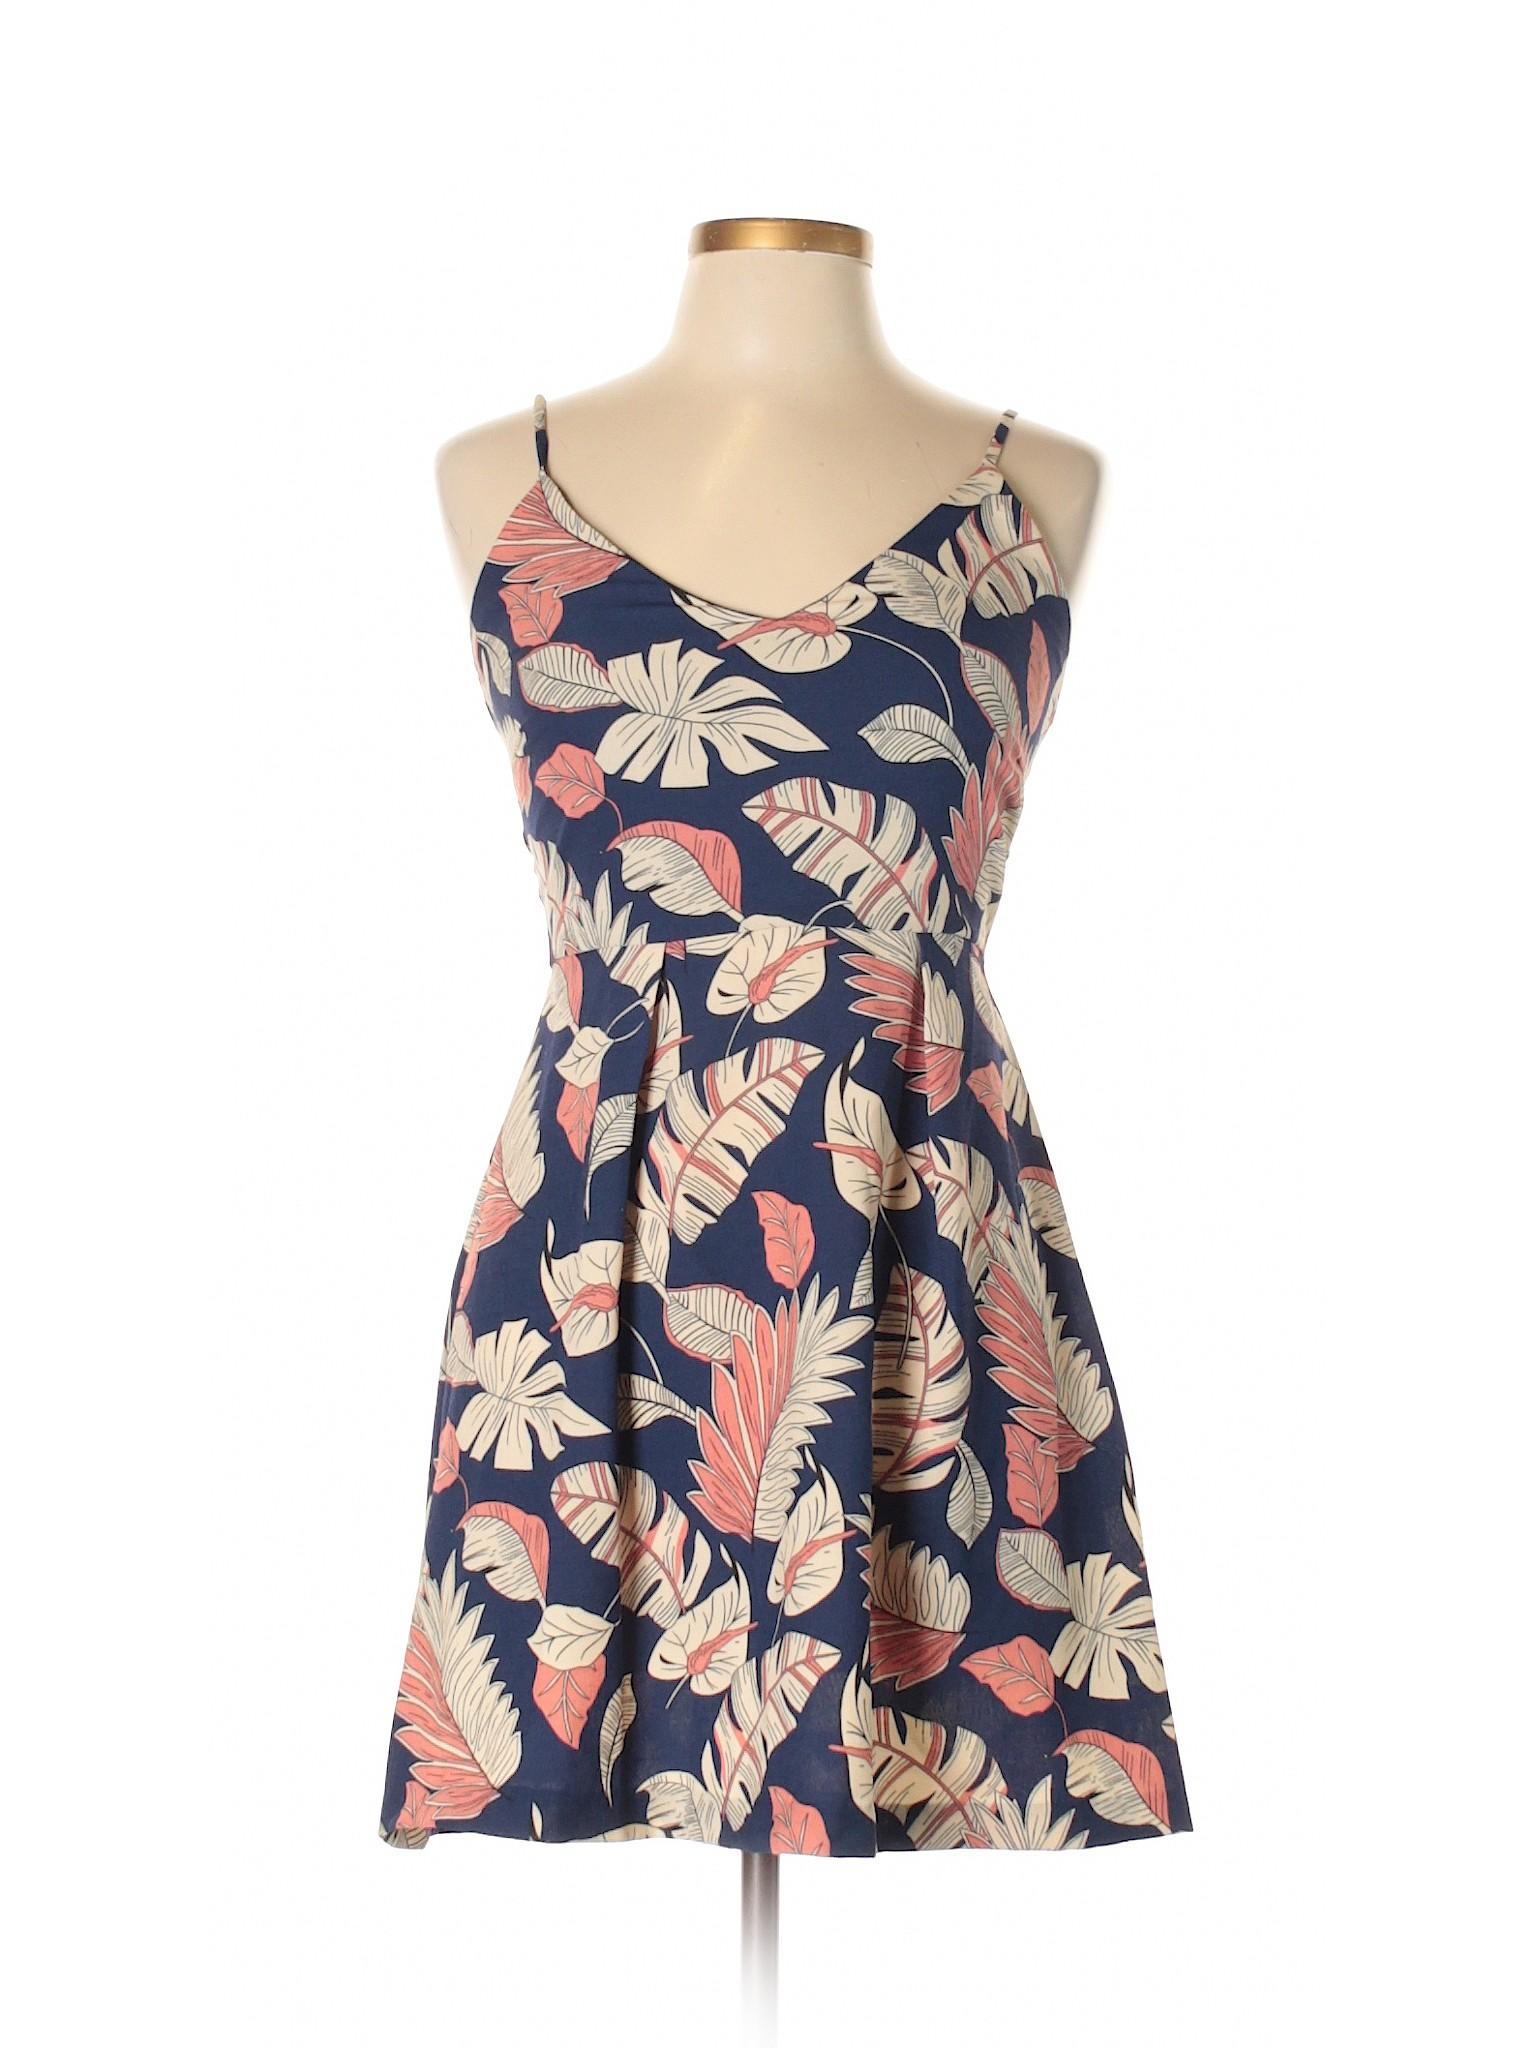 TOBI Casual Casual Dress Selling Dress Dress TOBI Casual Selling TOBI Selling Selling w5vgnFxqI